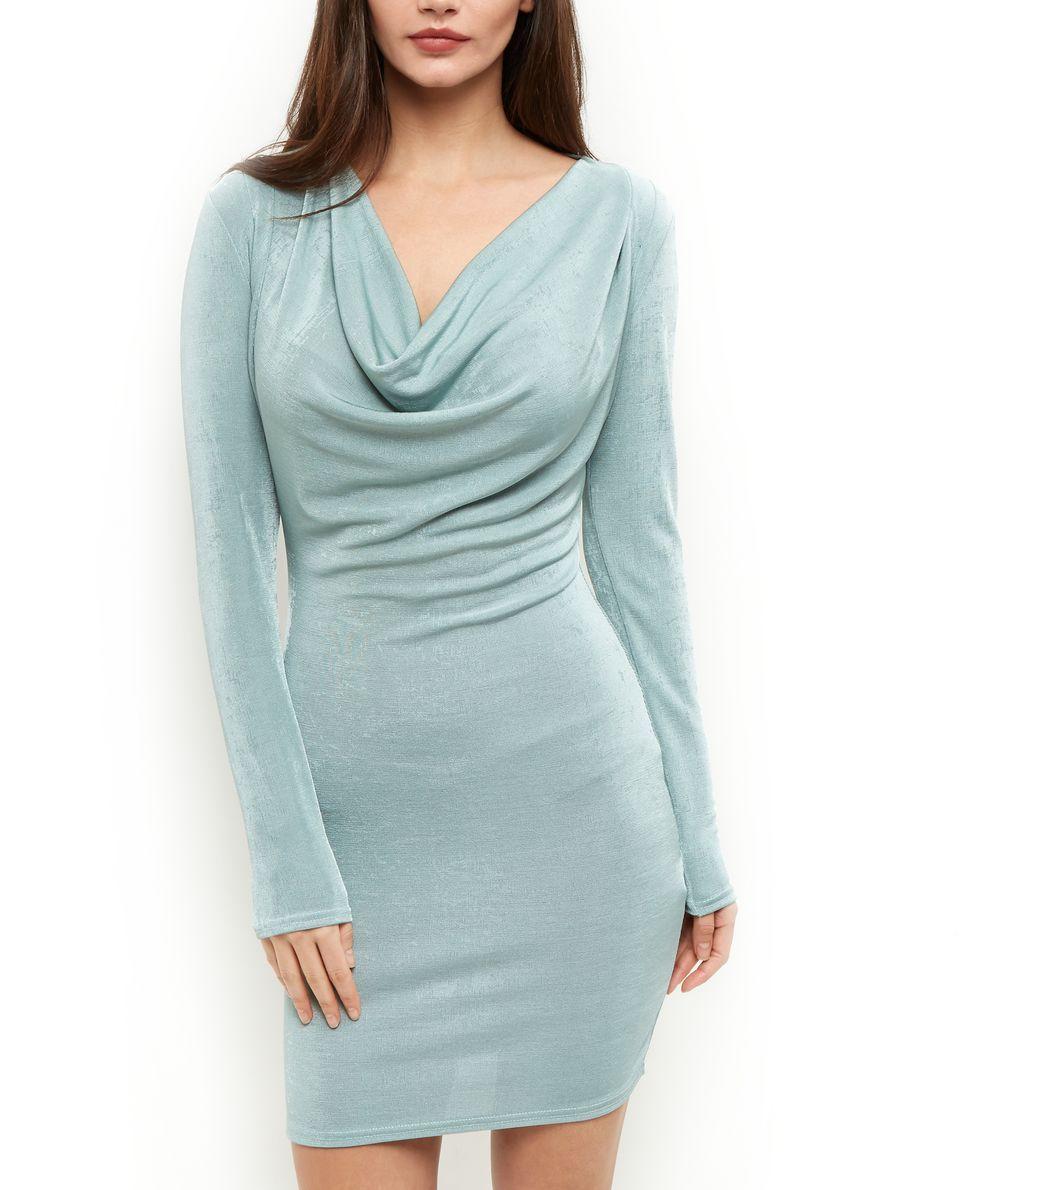 Blue Vanilla Mint Green Cowl Neck Bodycon Dress | Pinterest | Cowl ...